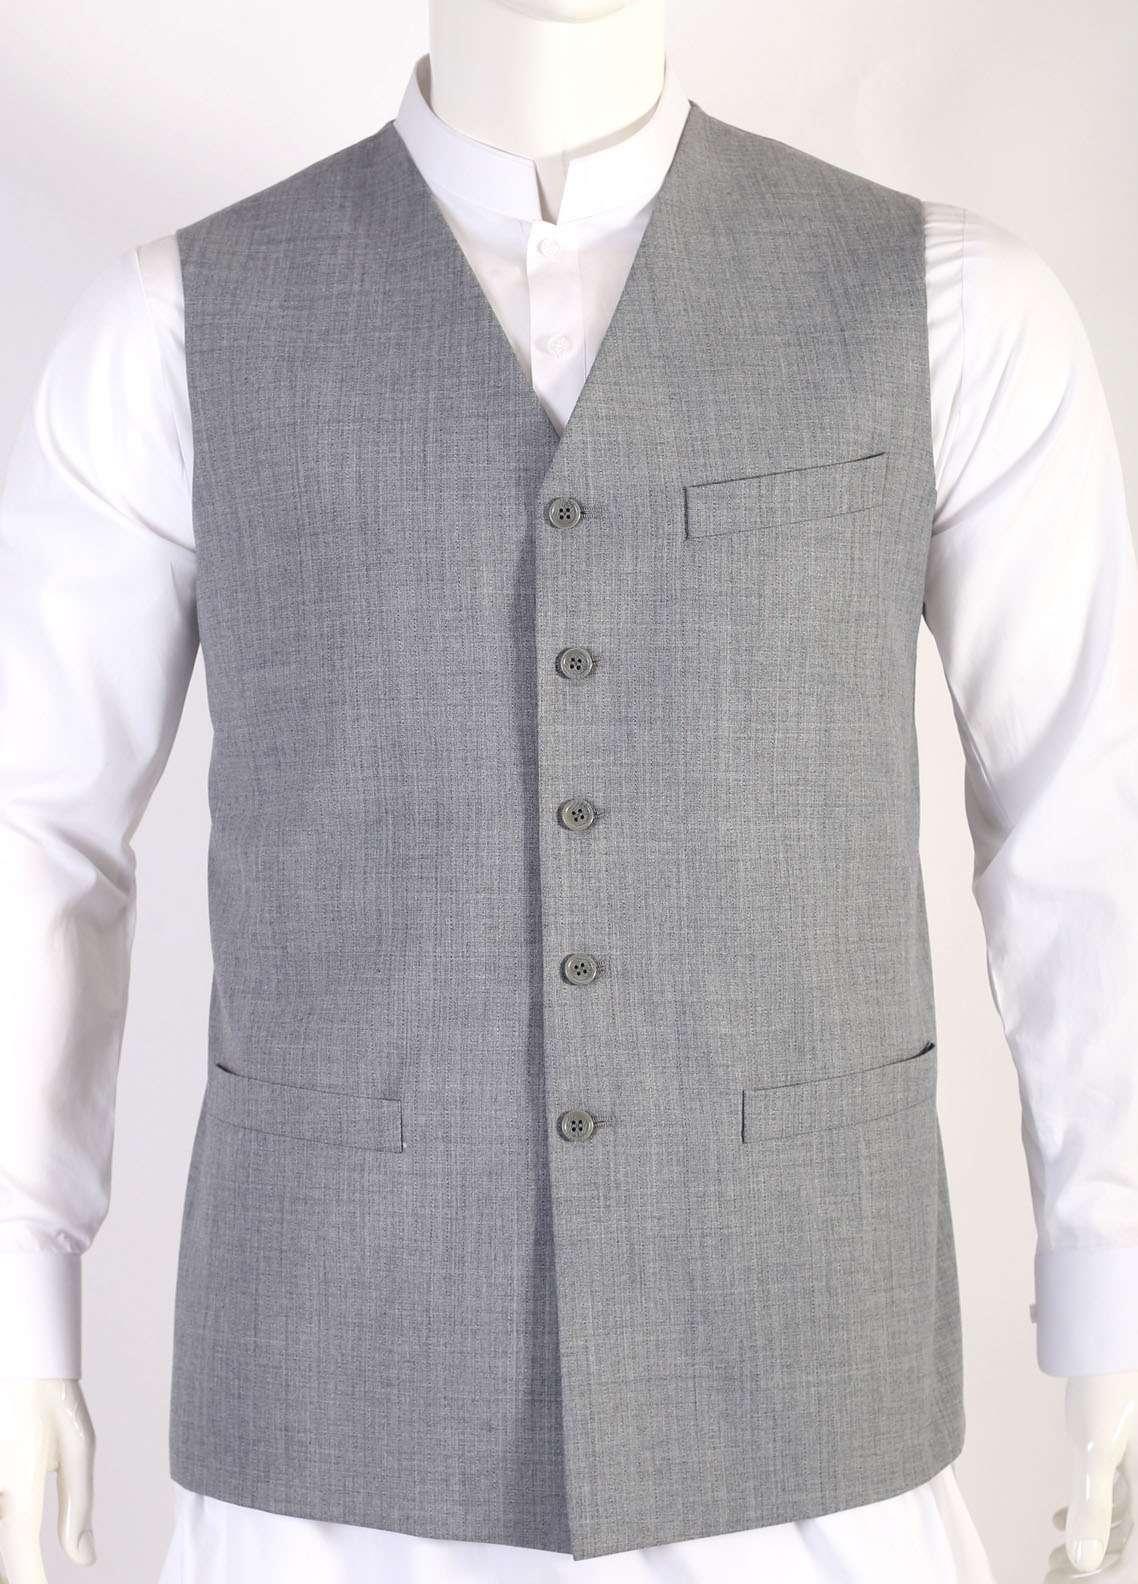 Lawrencepur Wool Blend Plain Texture Men Waistcoats - Light Grey LW18W 11